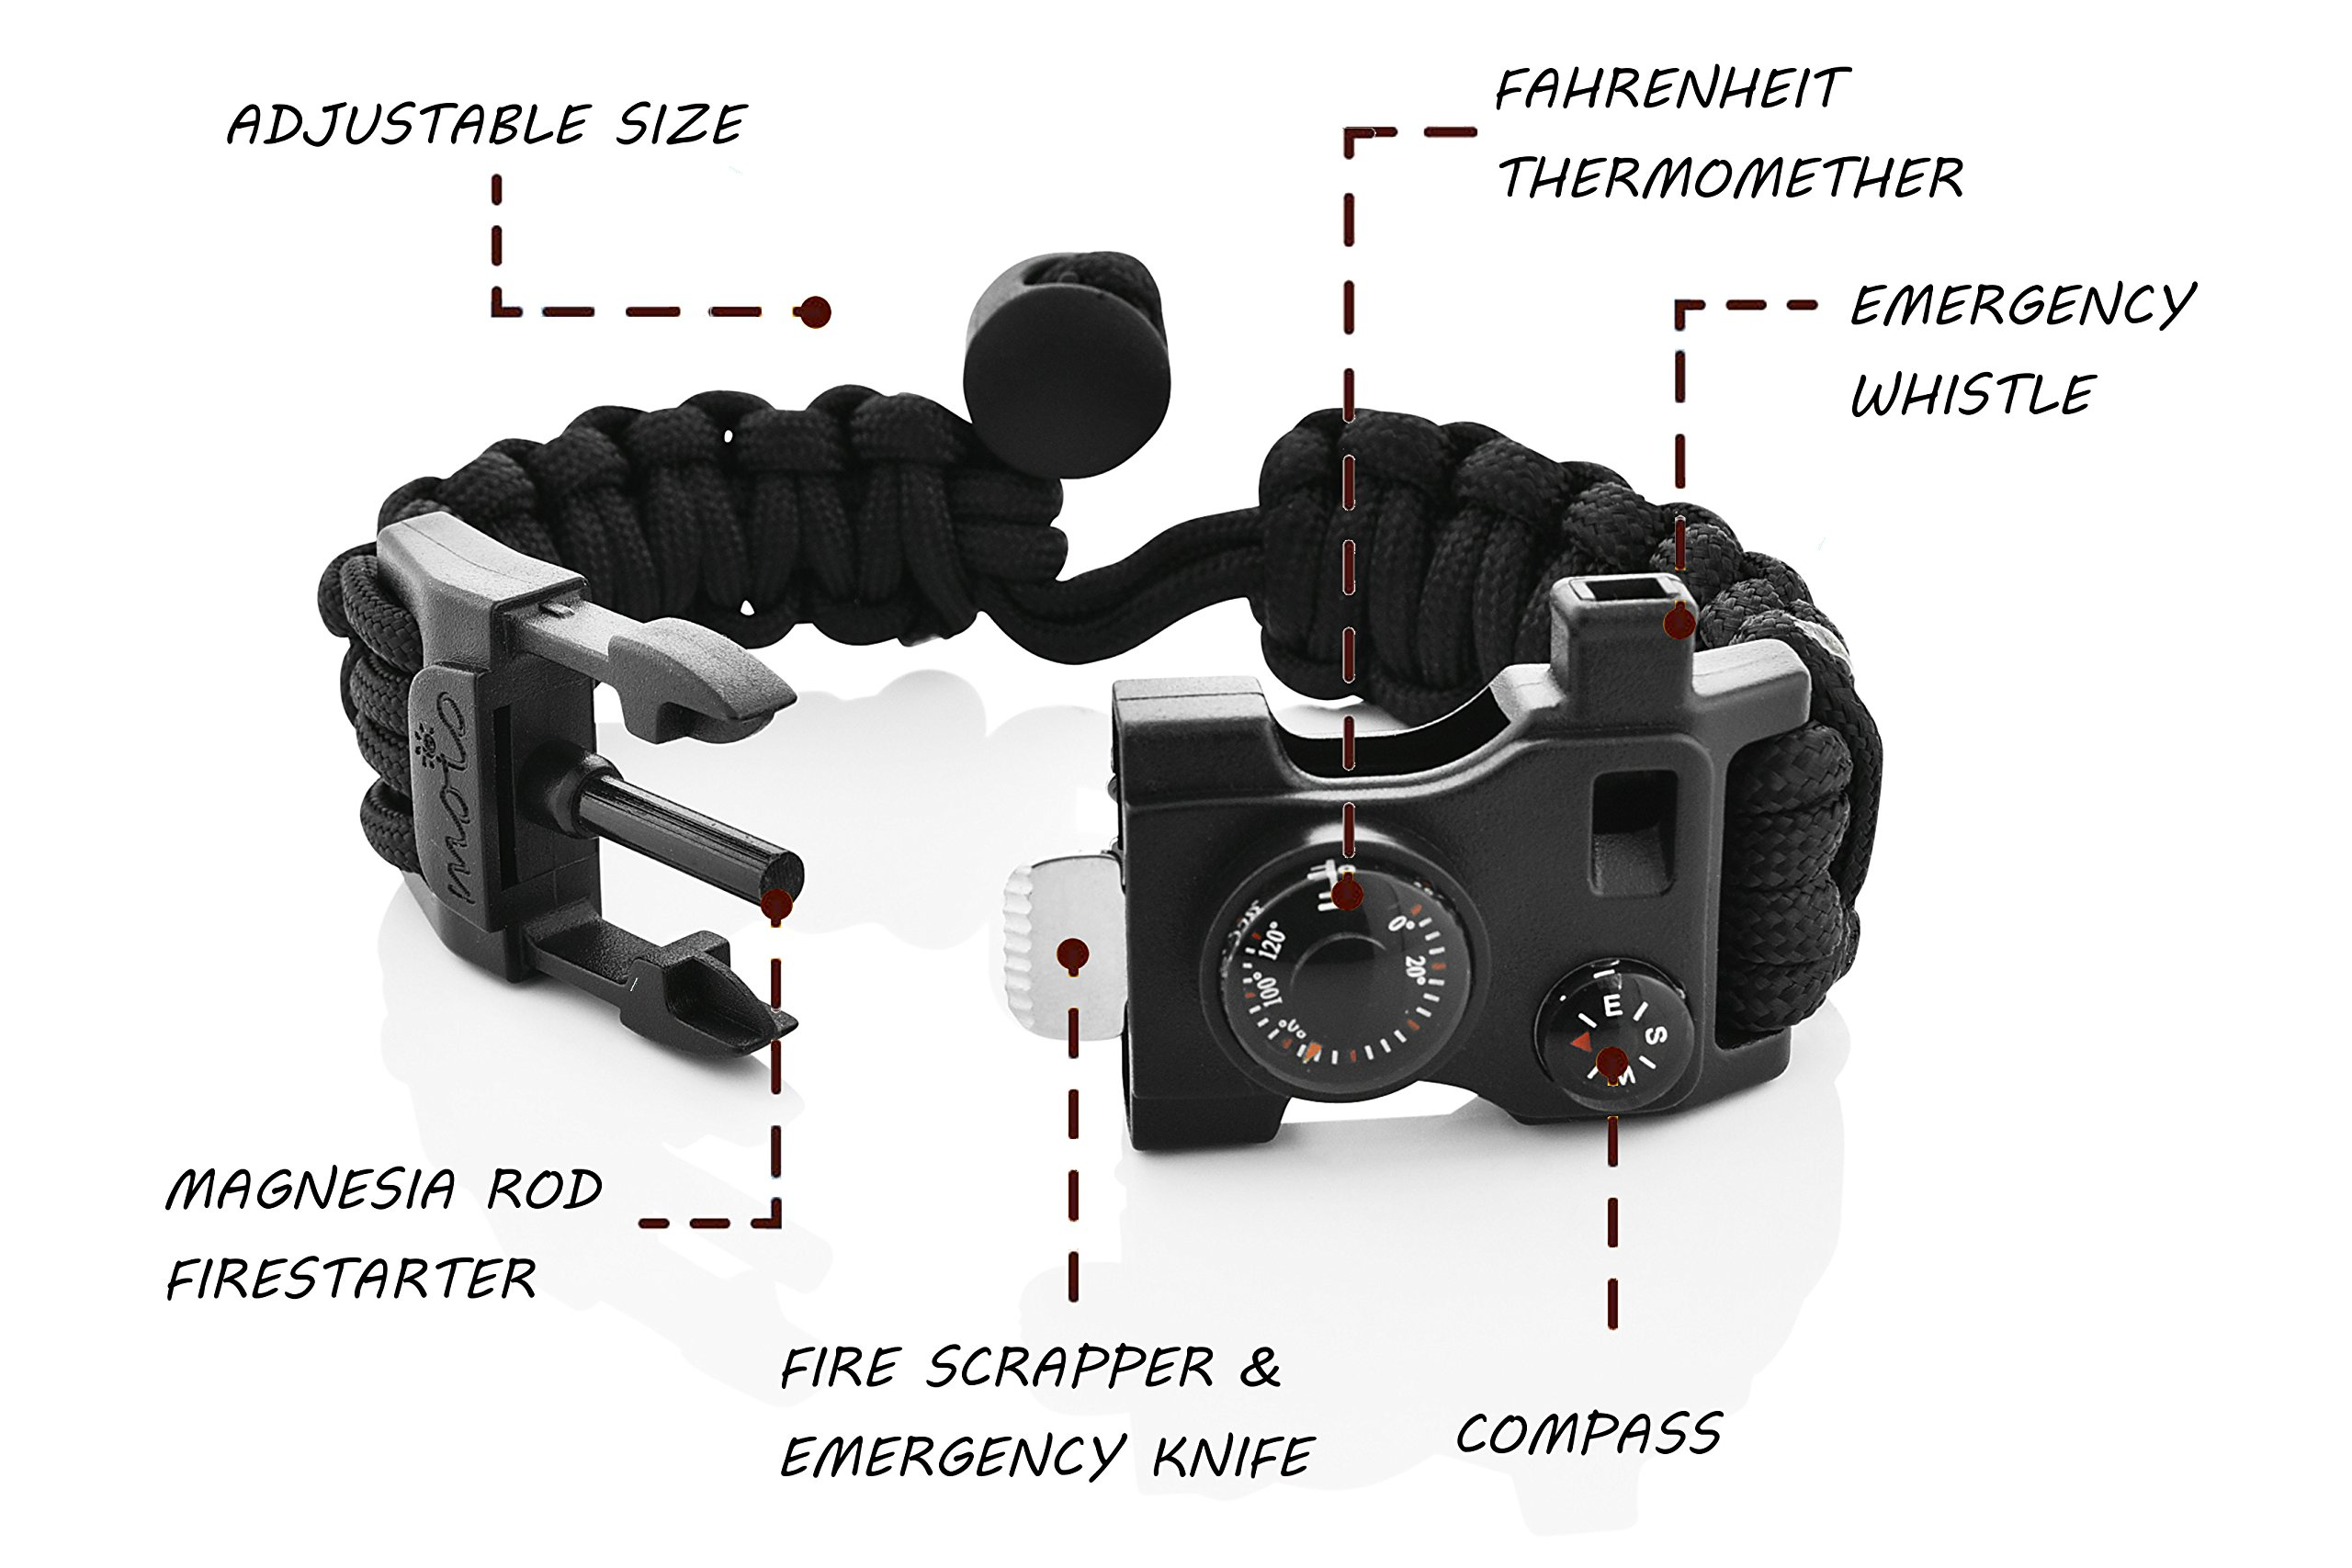 Paracord Bracelet - Survival Bracelet - Emergency Gear Men Women Kid Girl - MINI MULTI TOOL CARD - Scrapper - Whistle - Compass - Flint Fire Starter - Fahrenheit Thermometer - Hiking Camping